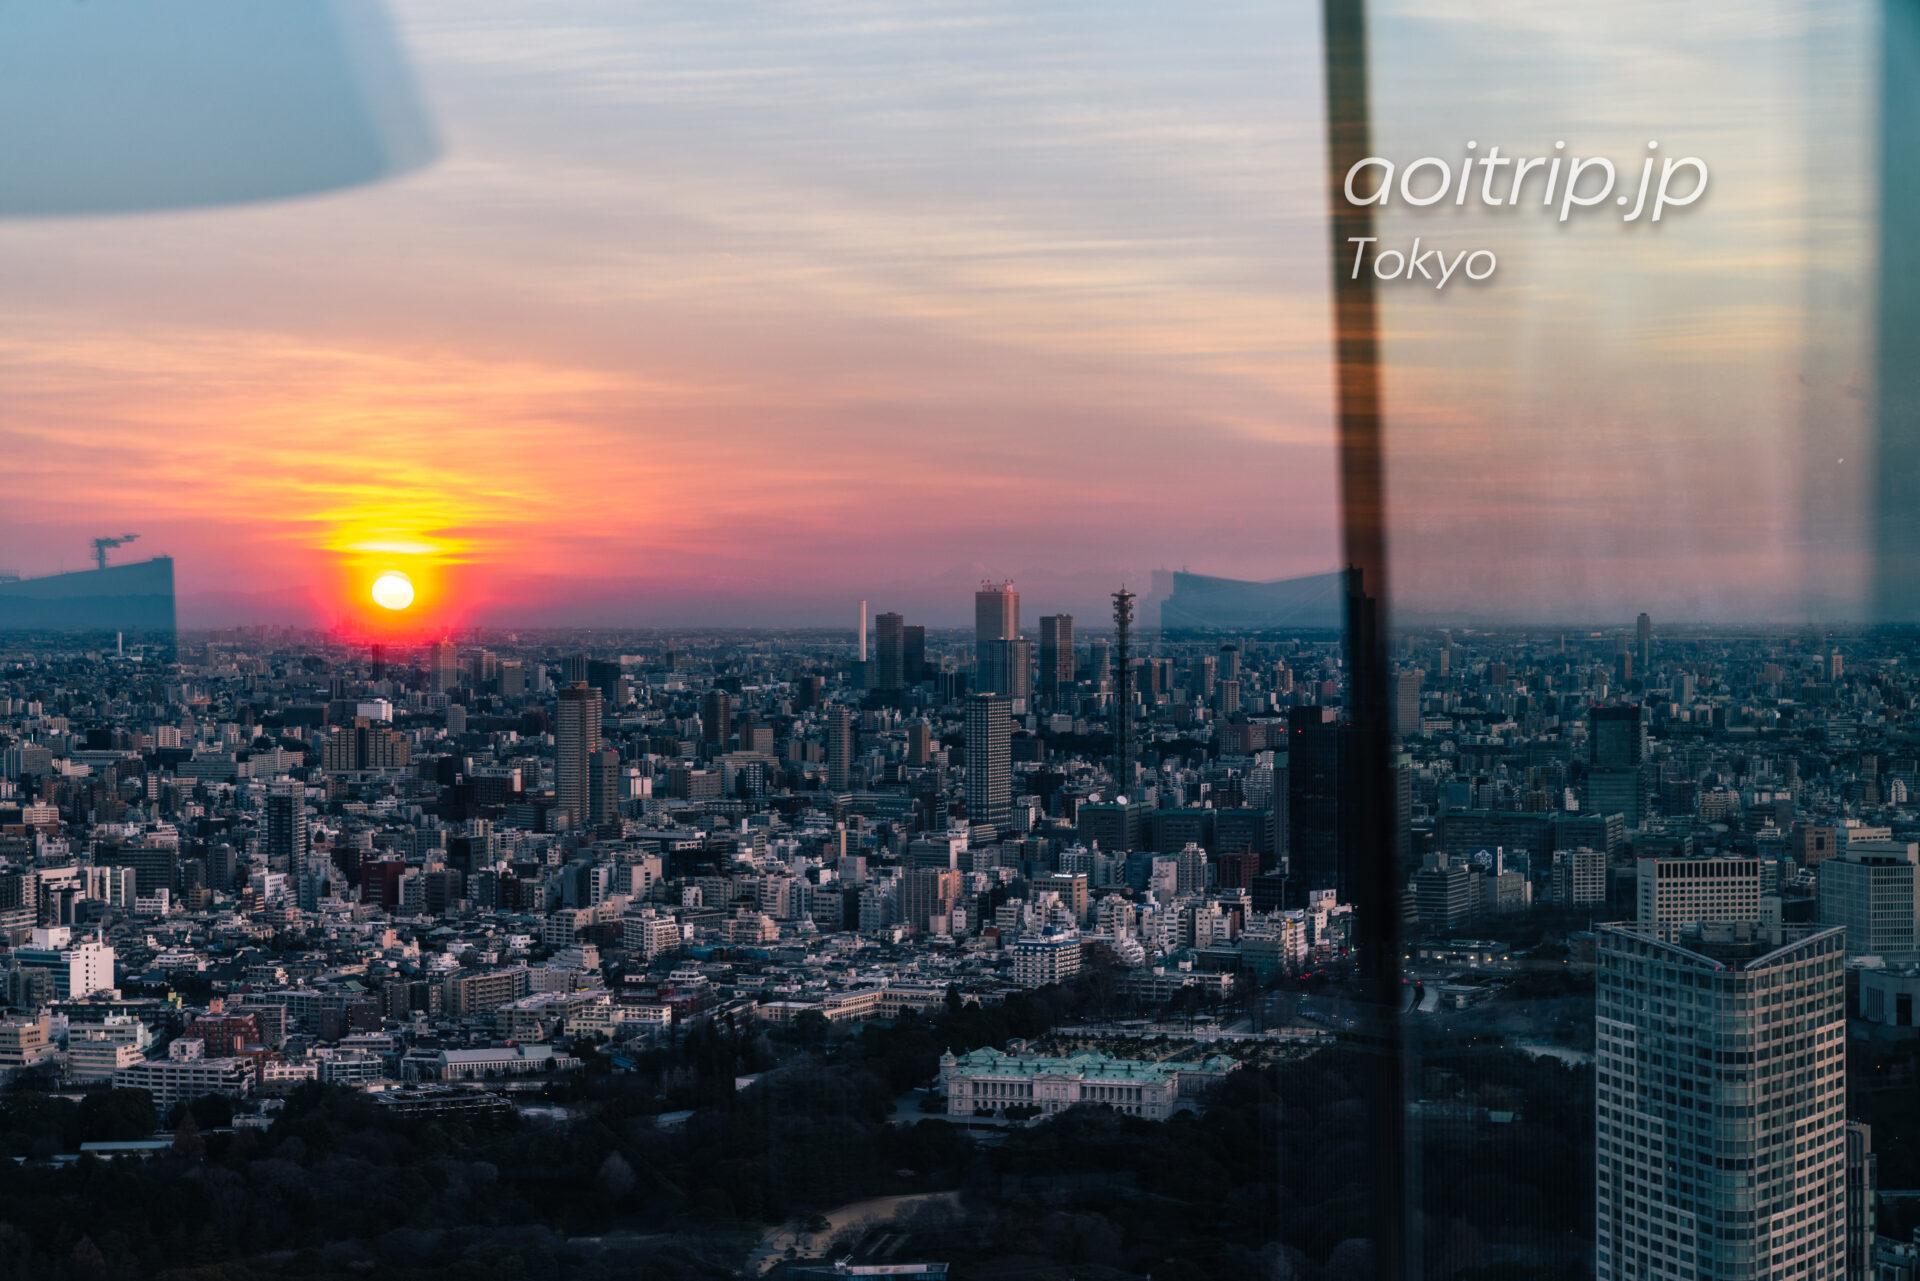 Tokyo Skyline ザ リッツカールトン東京から望む朝日と赤坂御用地、池袋